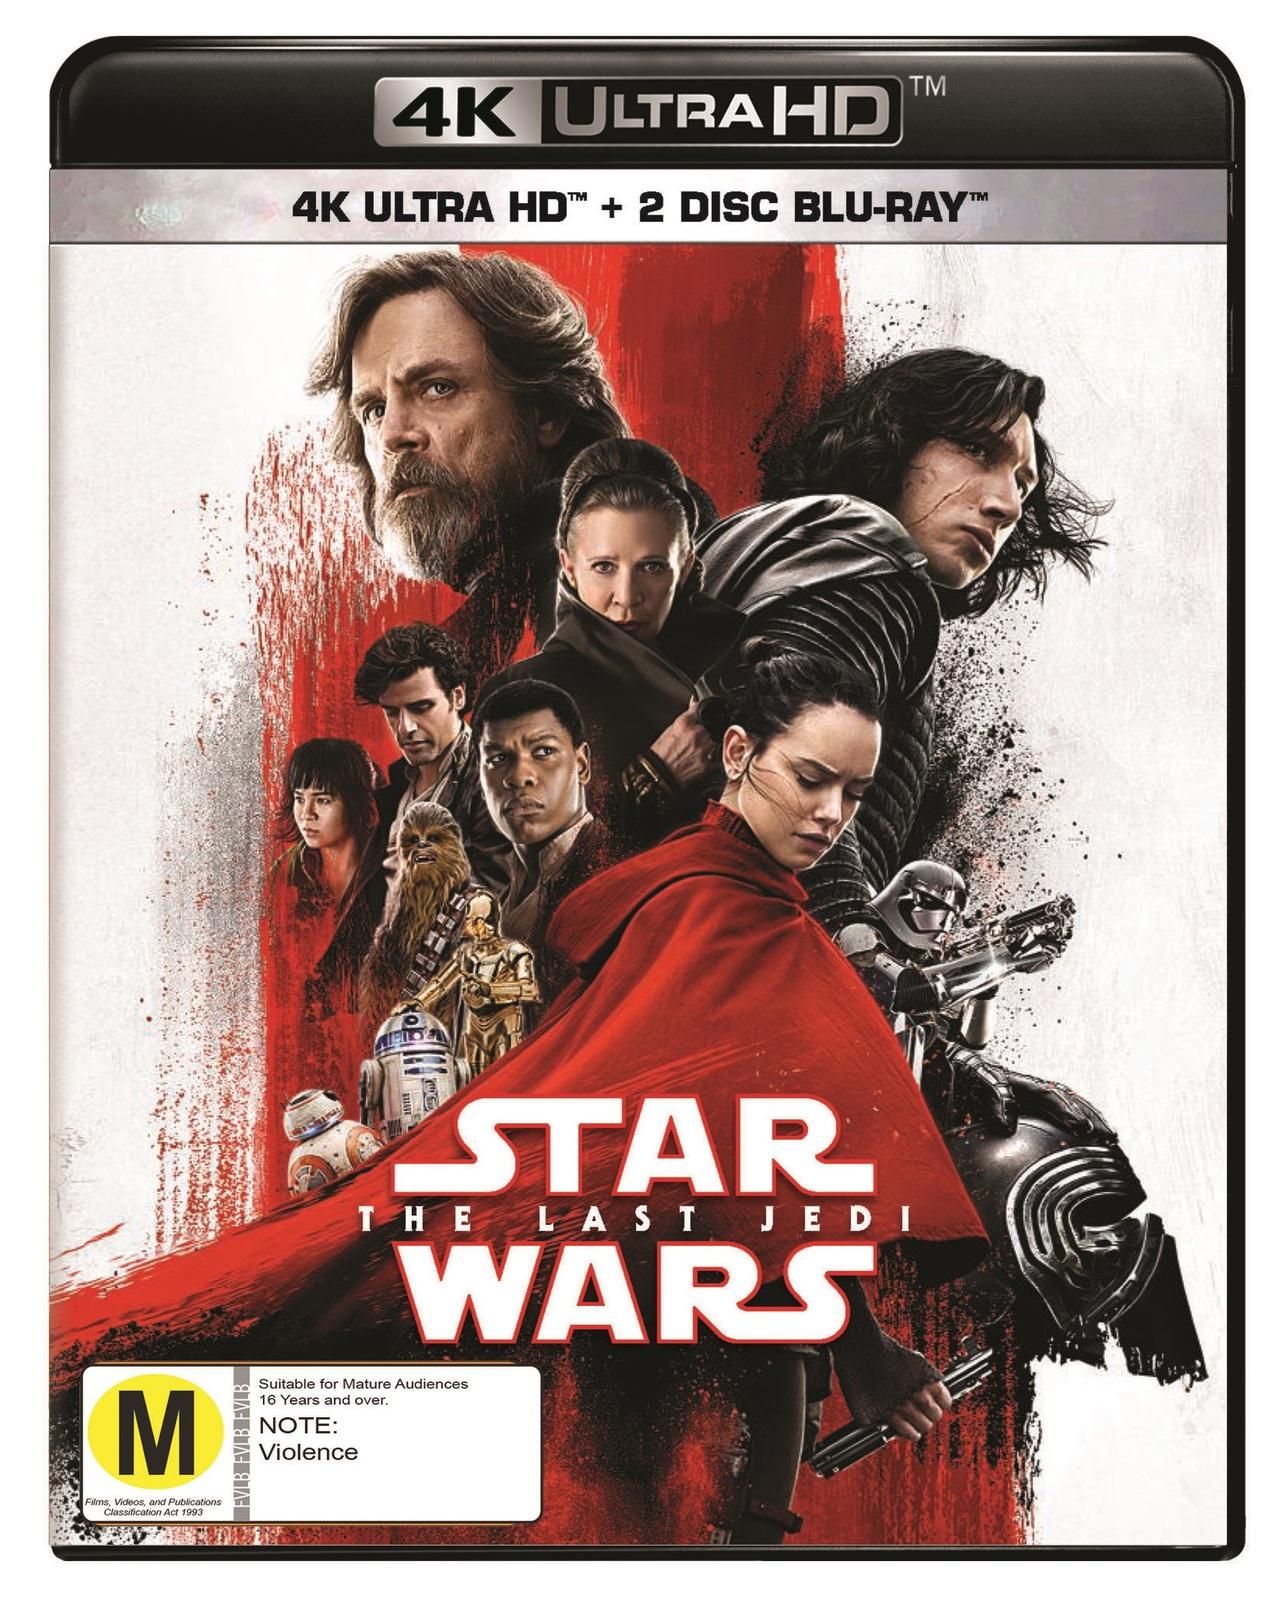 Star Wars: Episode VIII - The Last Jedi on UHD Blu-ray image